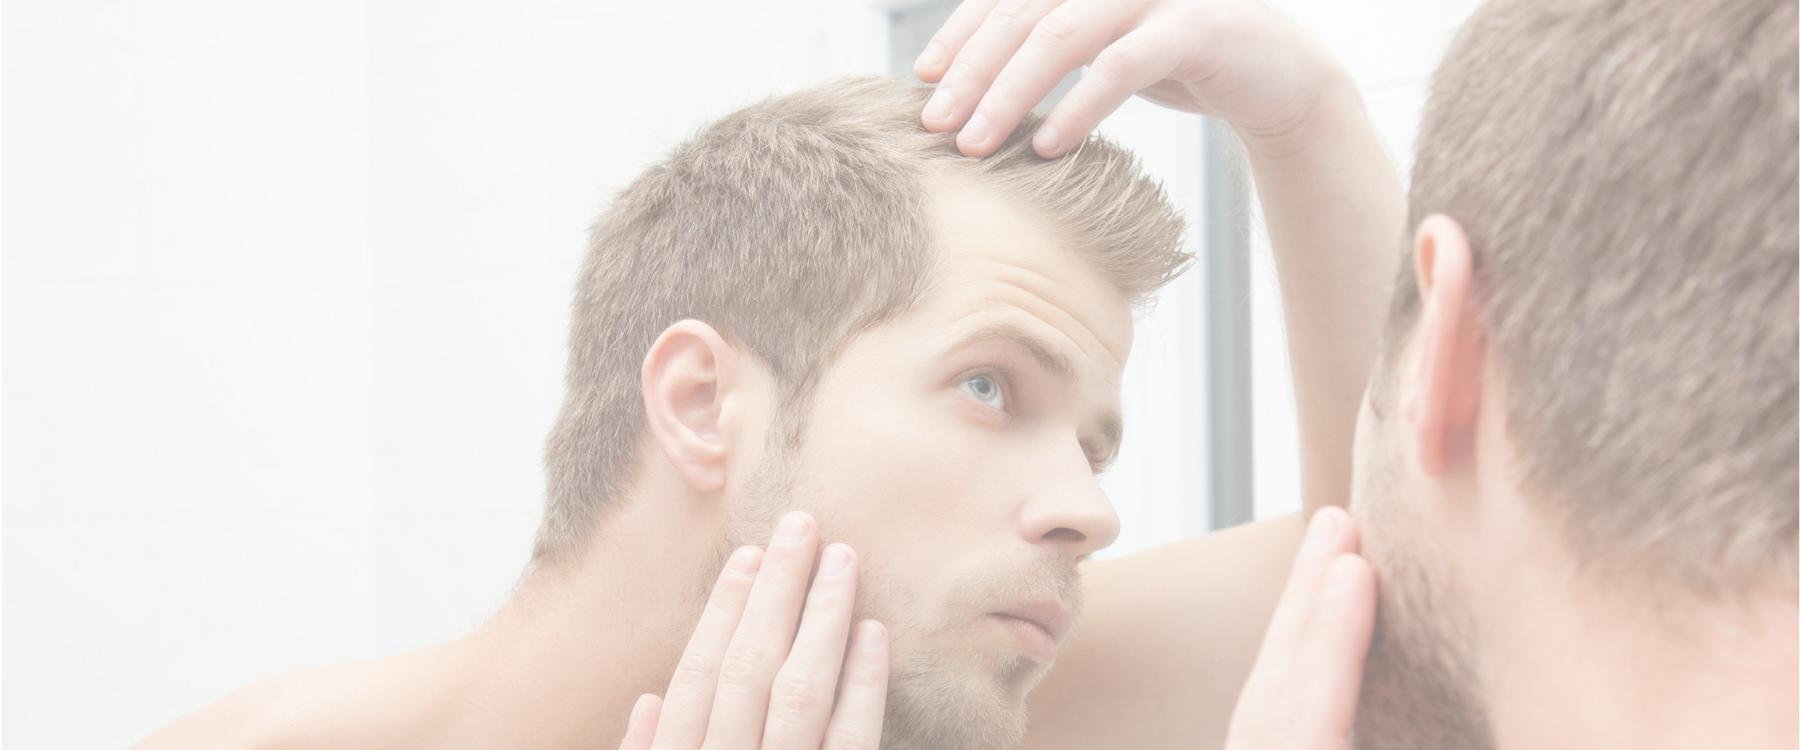 Micropigmentation - Receding Hairline, Balding Solutions